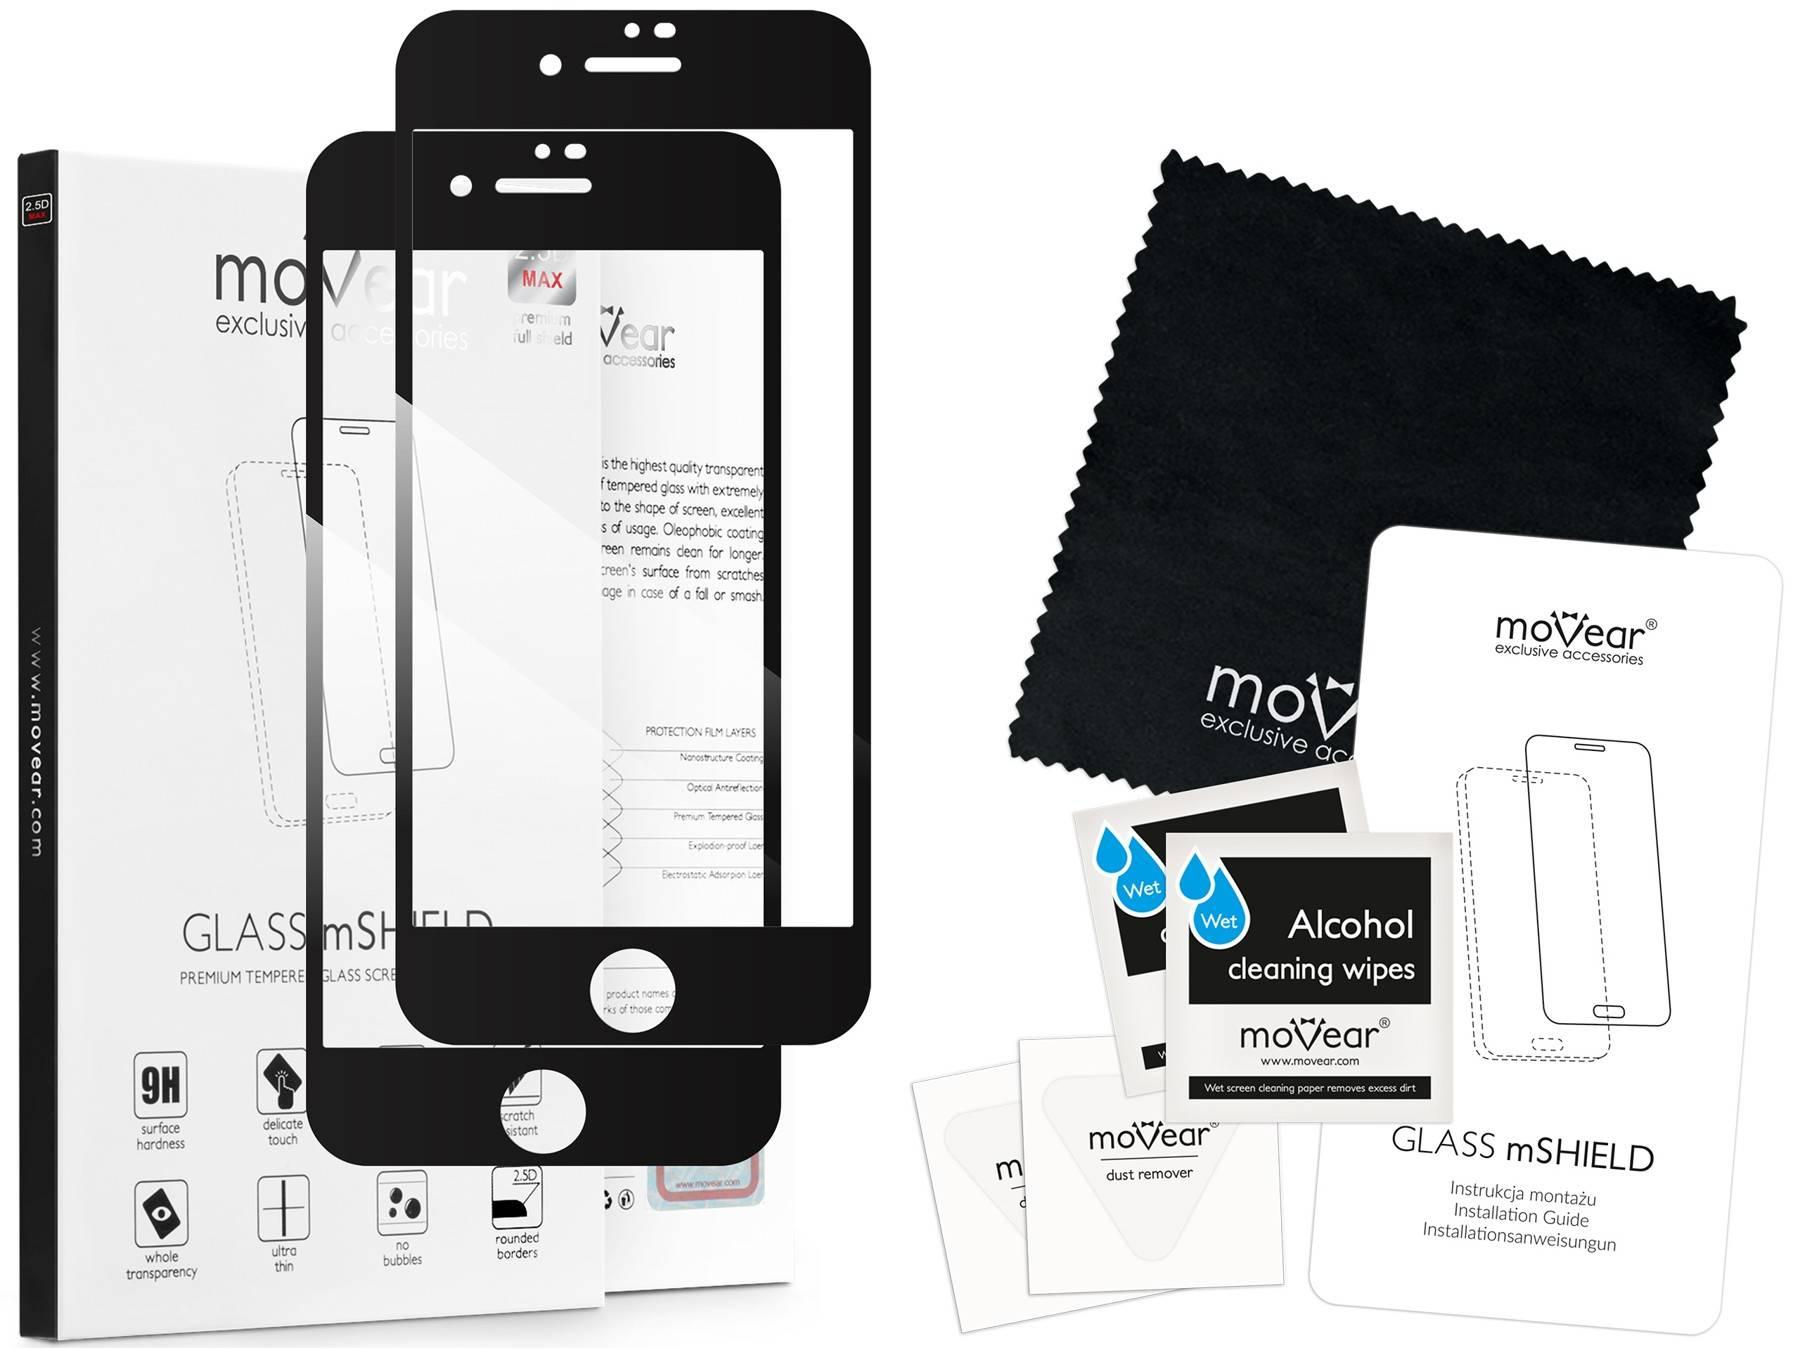 2 szt.   moVear Szkło Hartowane 2.5D MAX na Apple iPhone 8 Plus / 7 Plus   do etui, 9H   GLASS mSHIELD Czarny